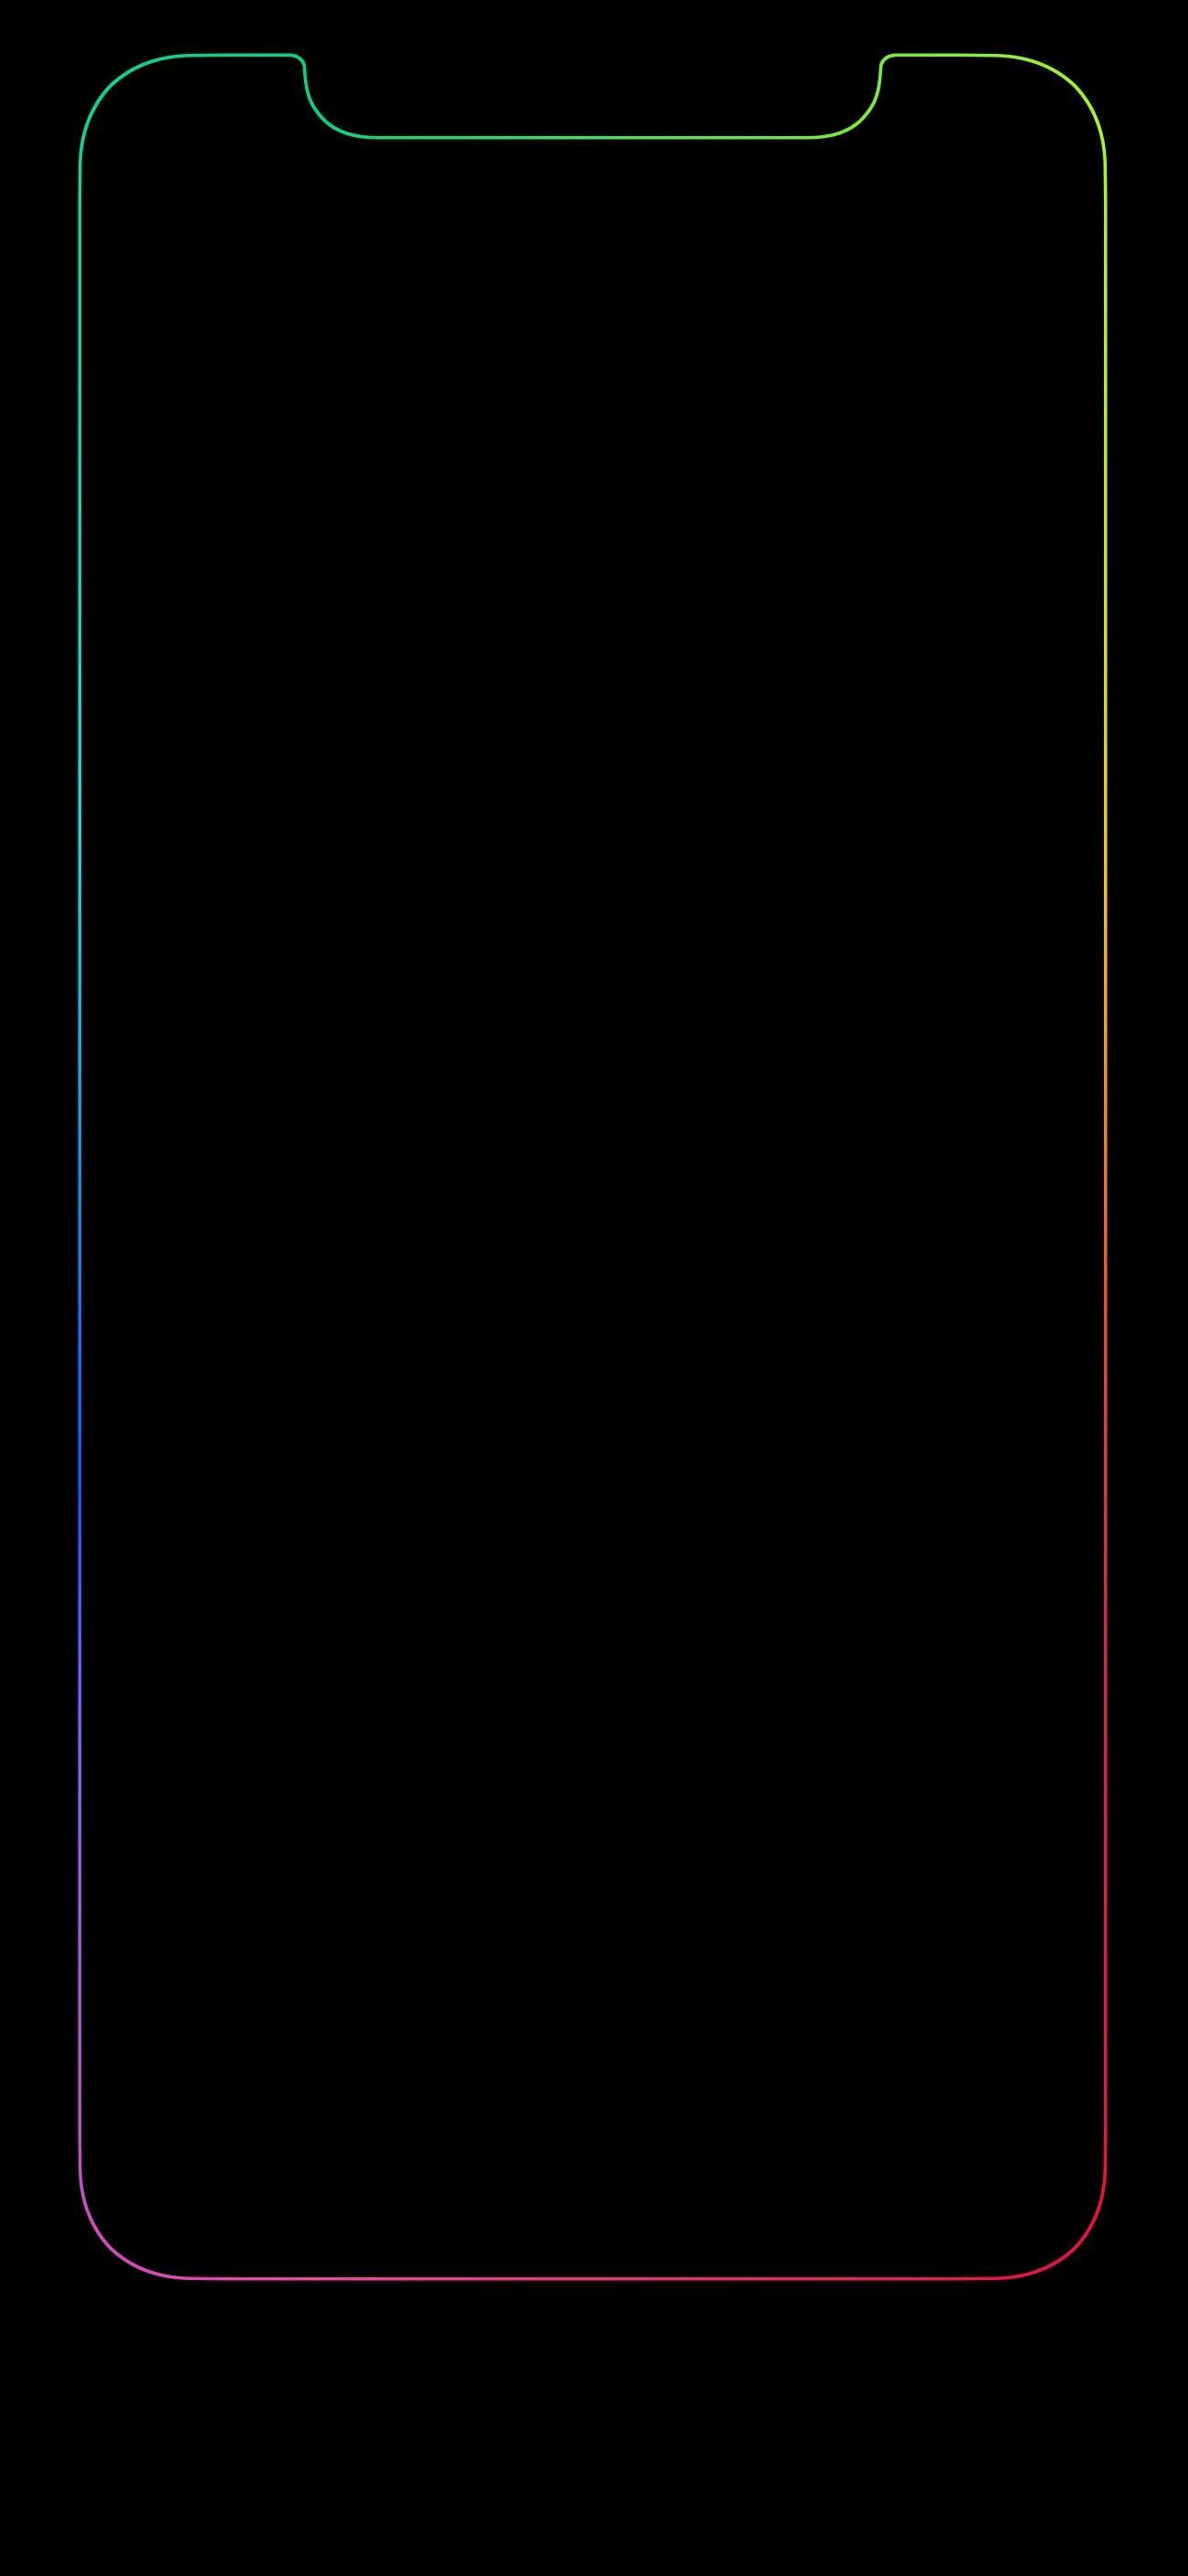 Iphone Notch Wallpaper : iphone, notch, wallpaper, IPhone, Notch, Wallpapers, Wallpaper